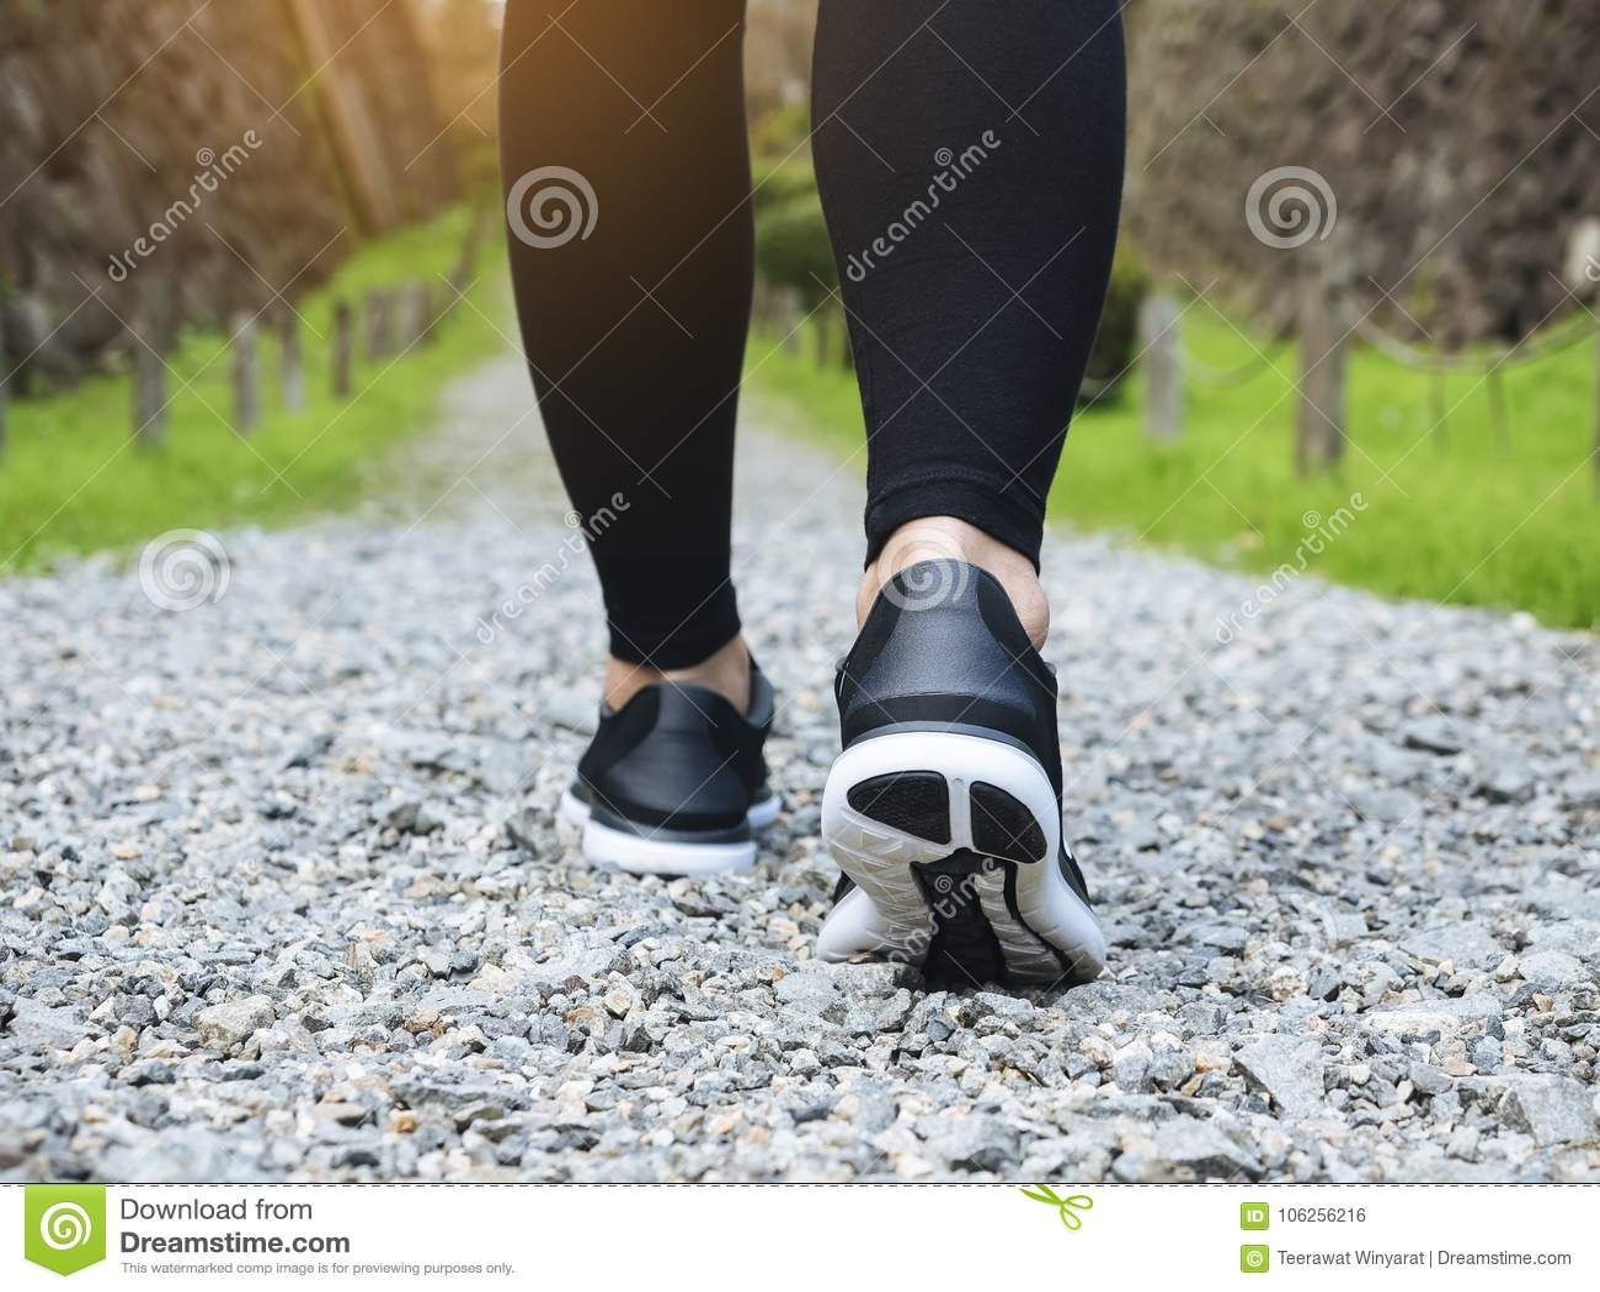 Trail walking woman legs with sport shoe Trailt Park outdoor